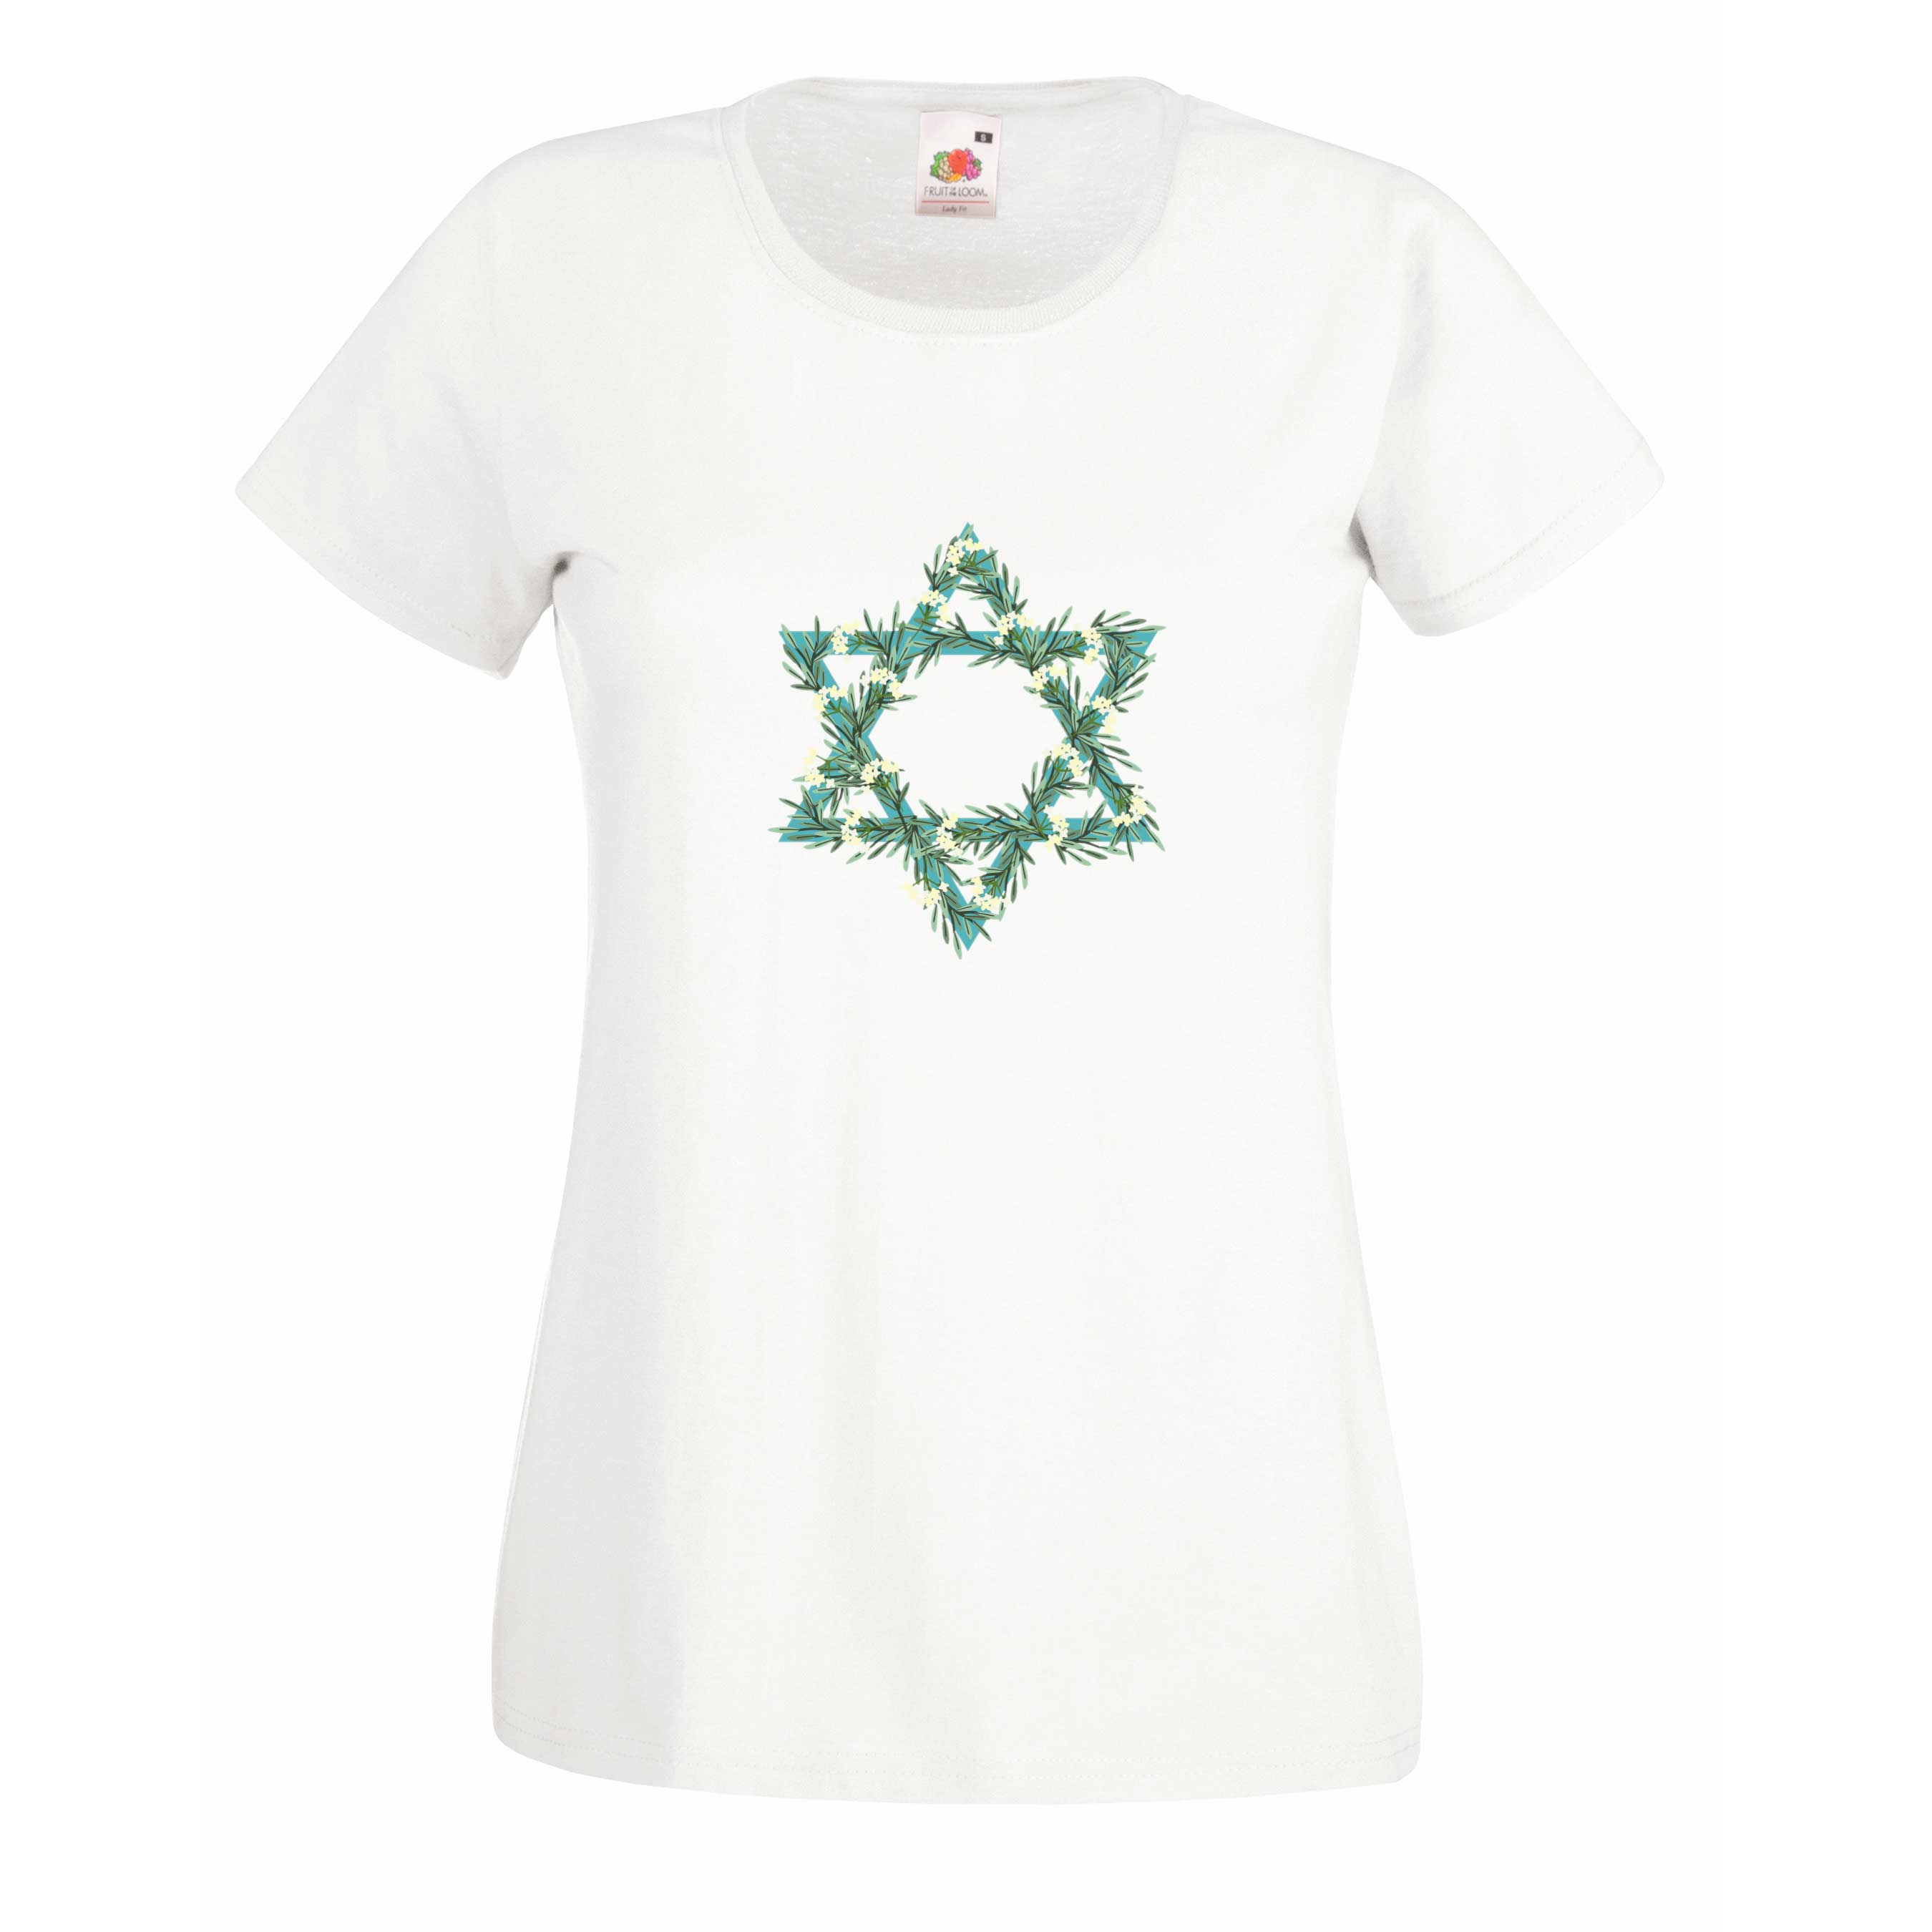 Floral Star design for t-shirt, hoodie & sweatshirt